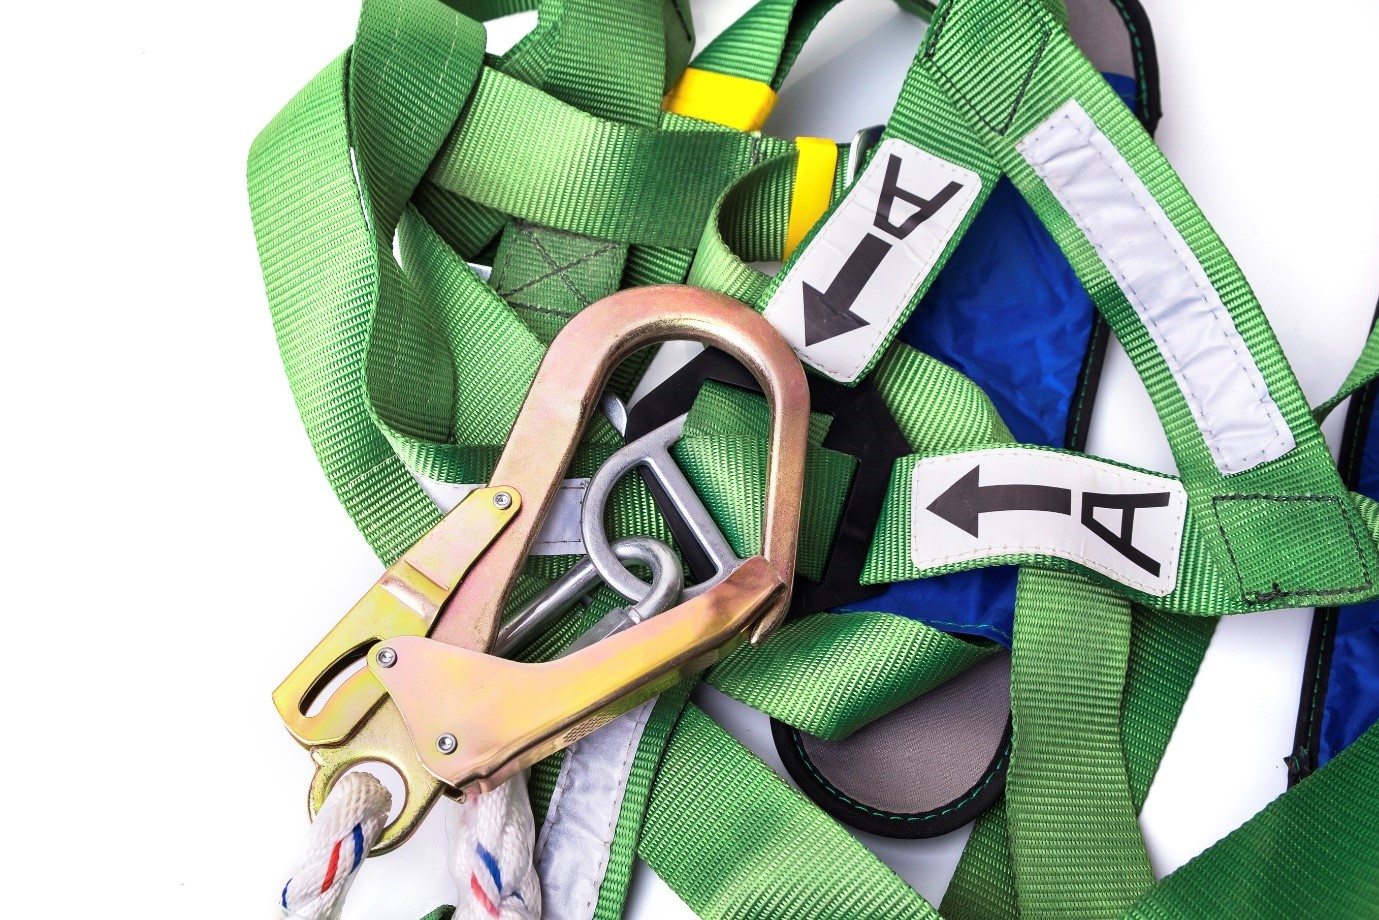 harness IPAF